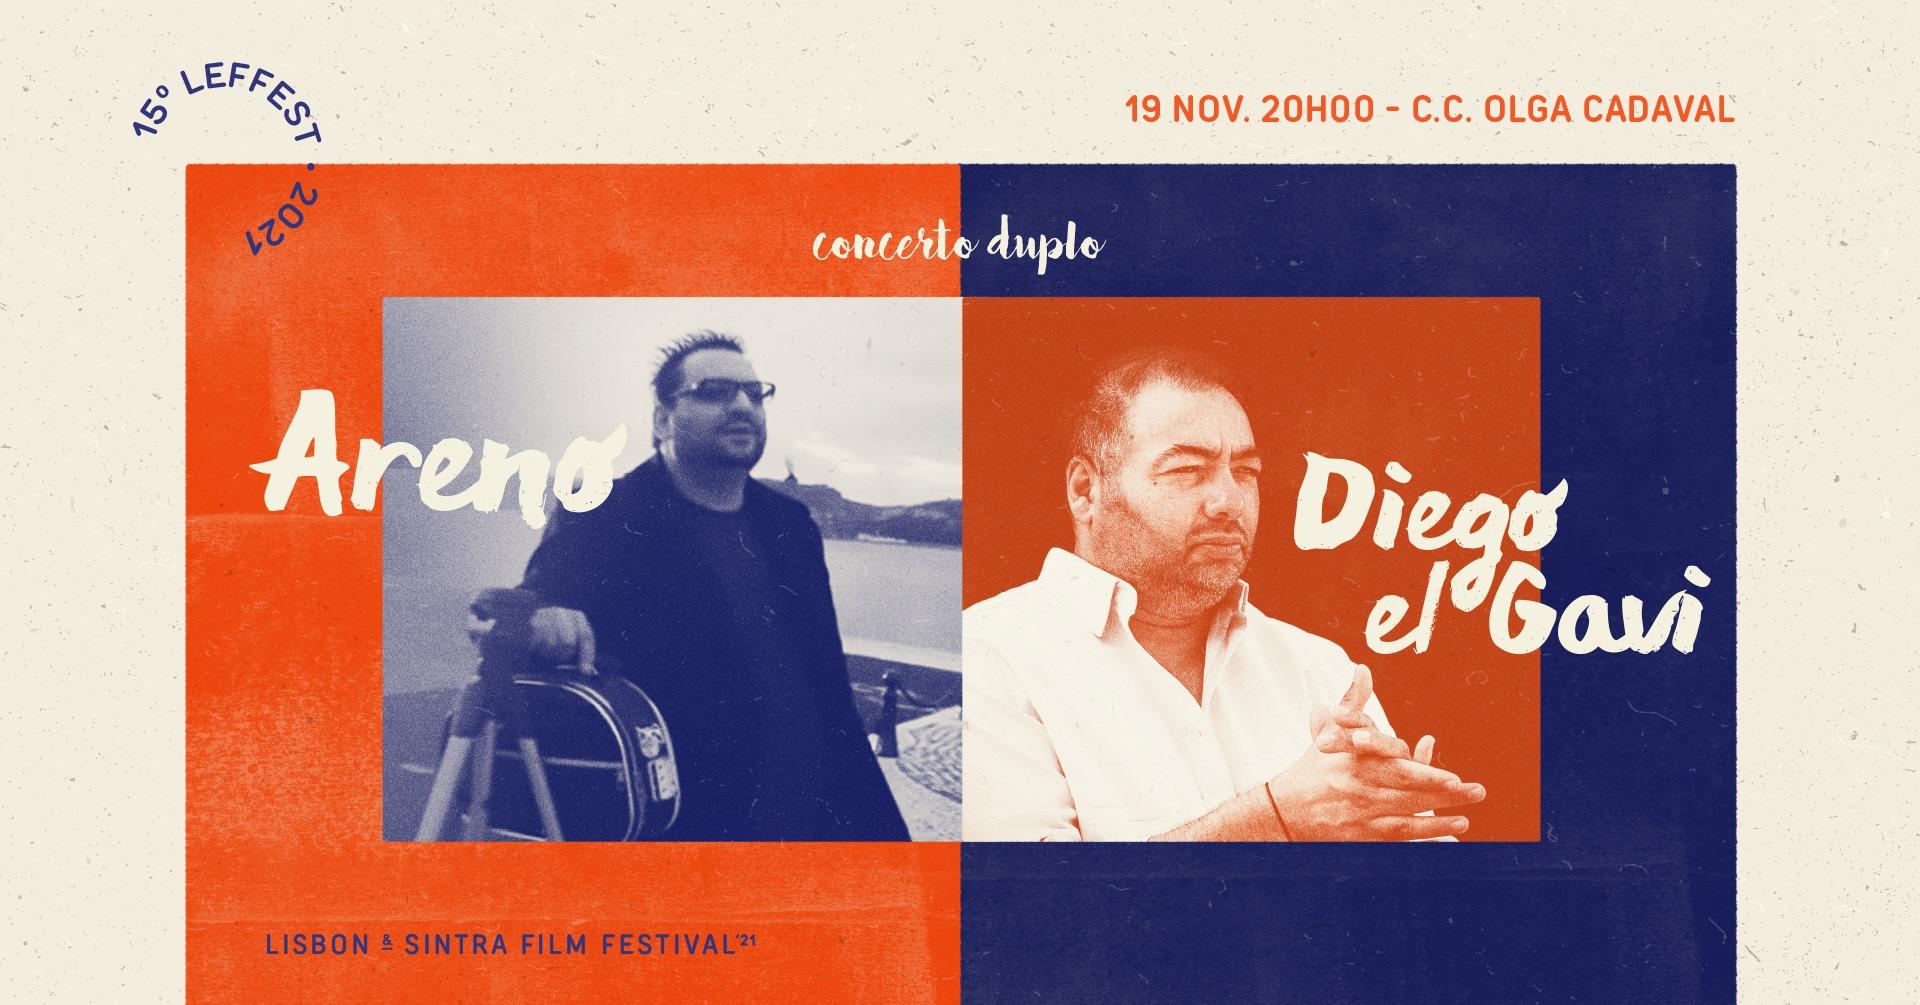 15º LEFFEST -  Concerto Duplo | Areno + Diego El Gavi